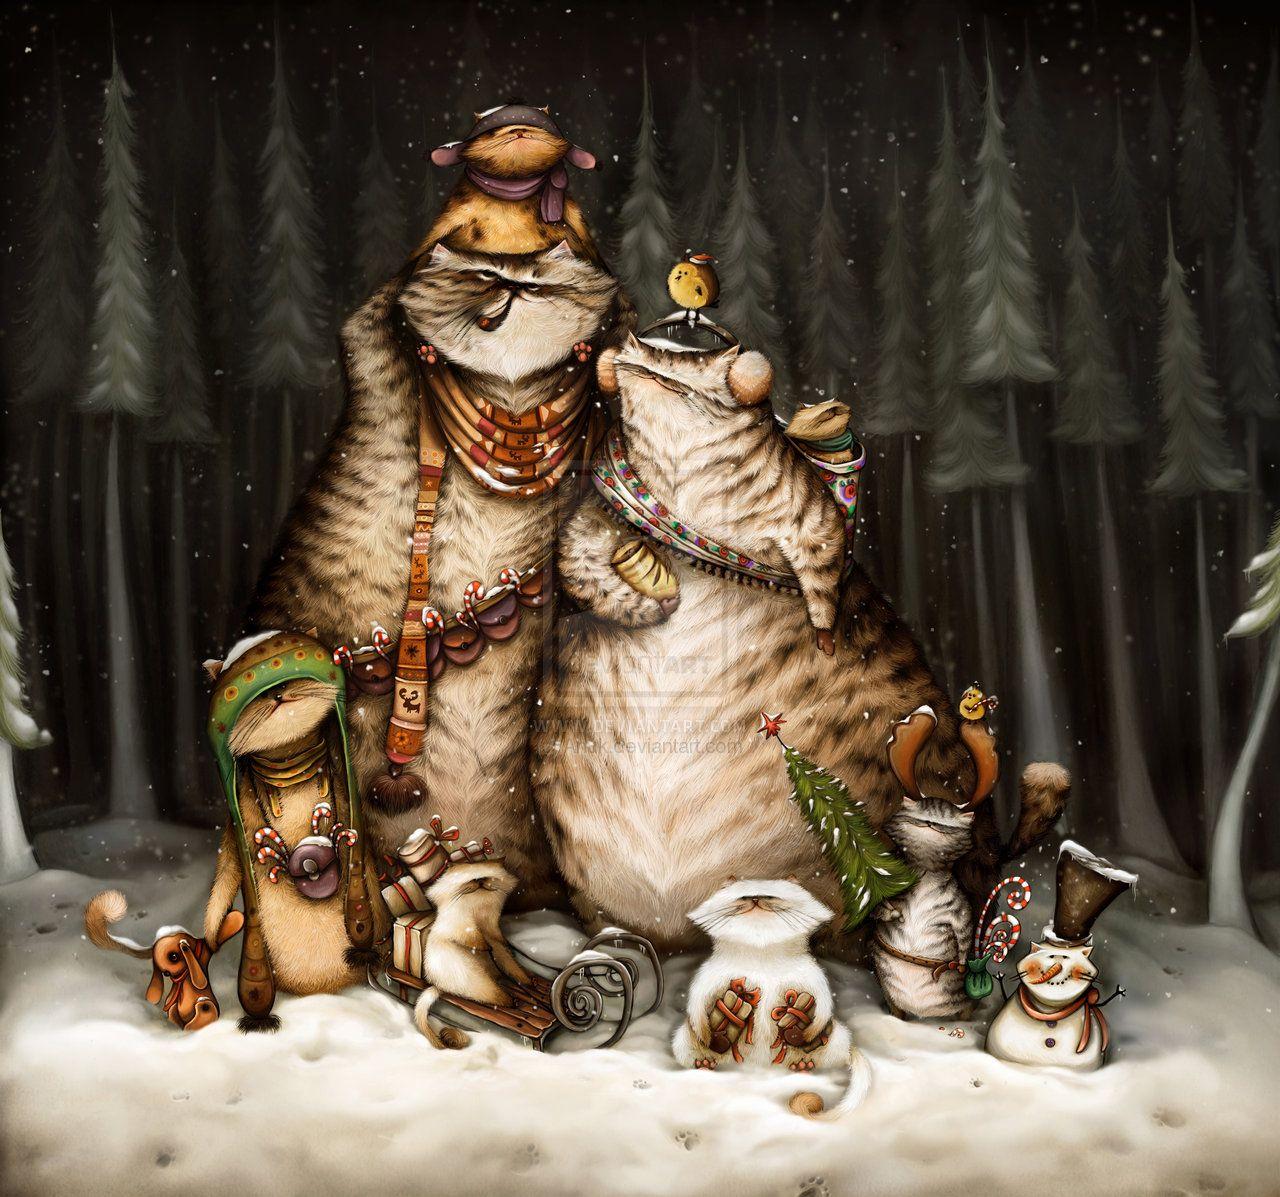 Christmas time by Anuk.deviantart.com on @DeviantArt